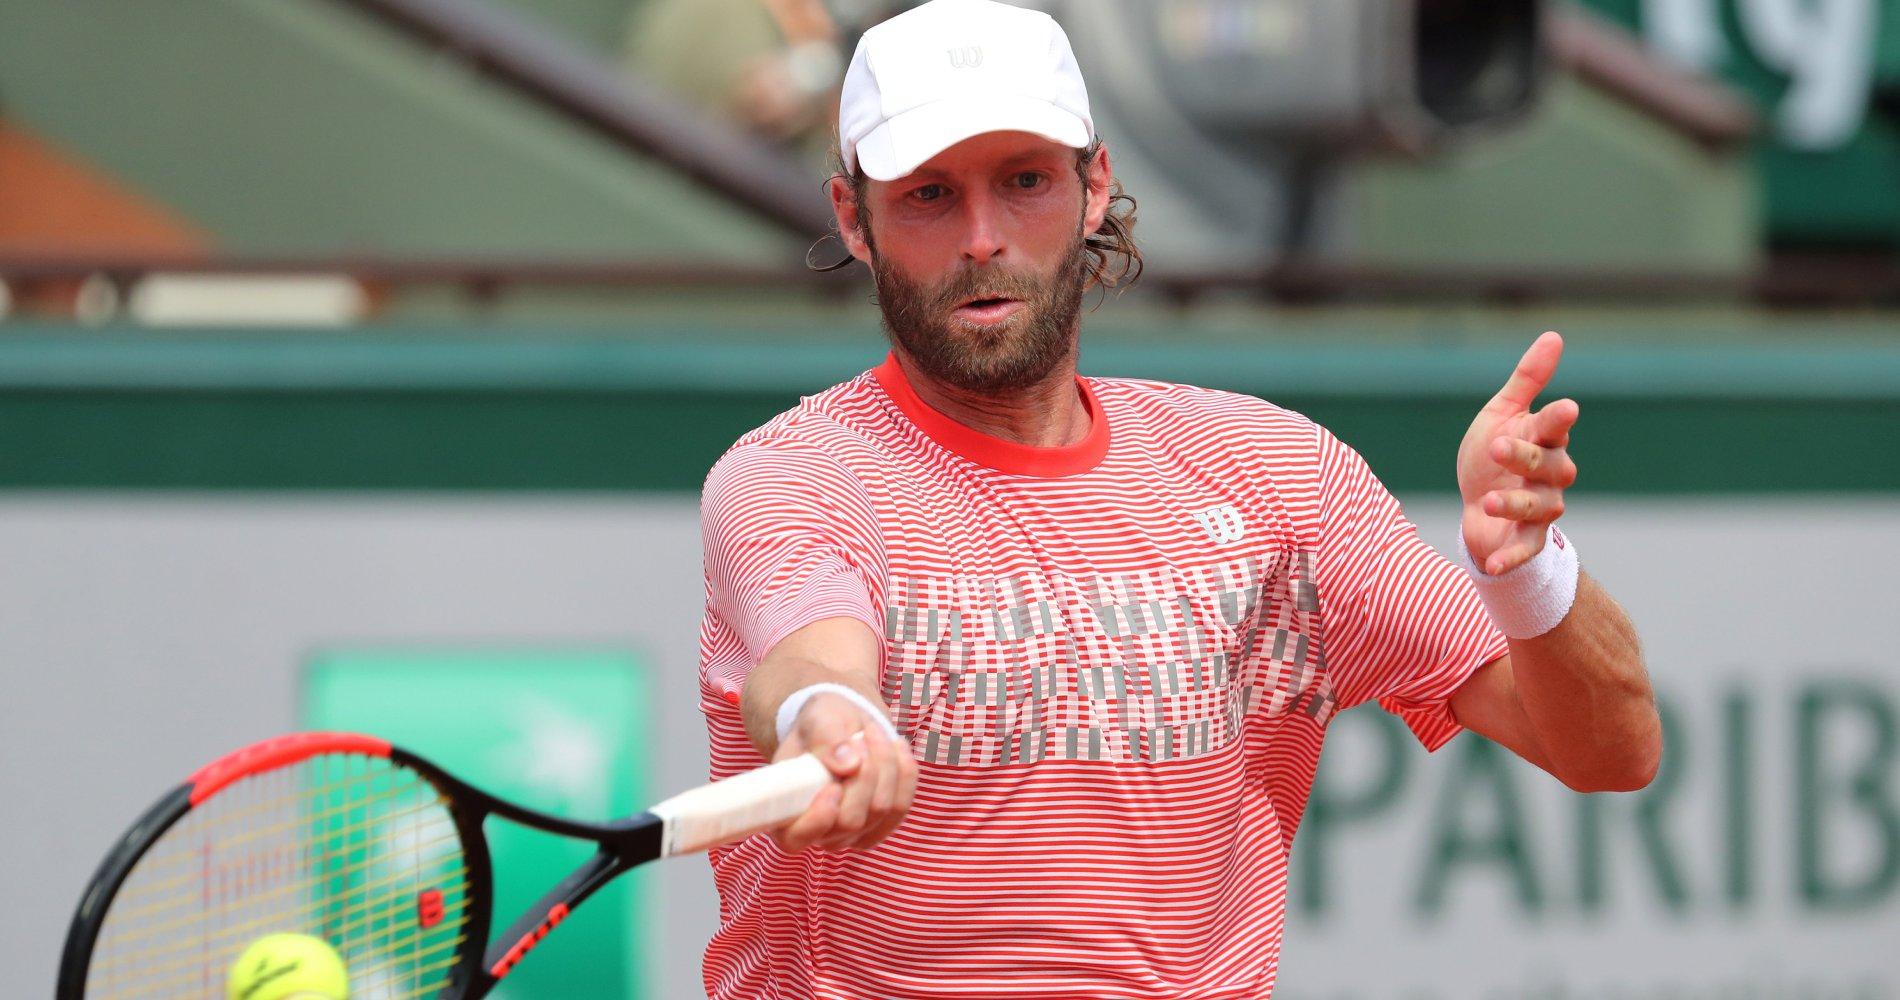 Stéphane Robert, Roland-Garros 2017